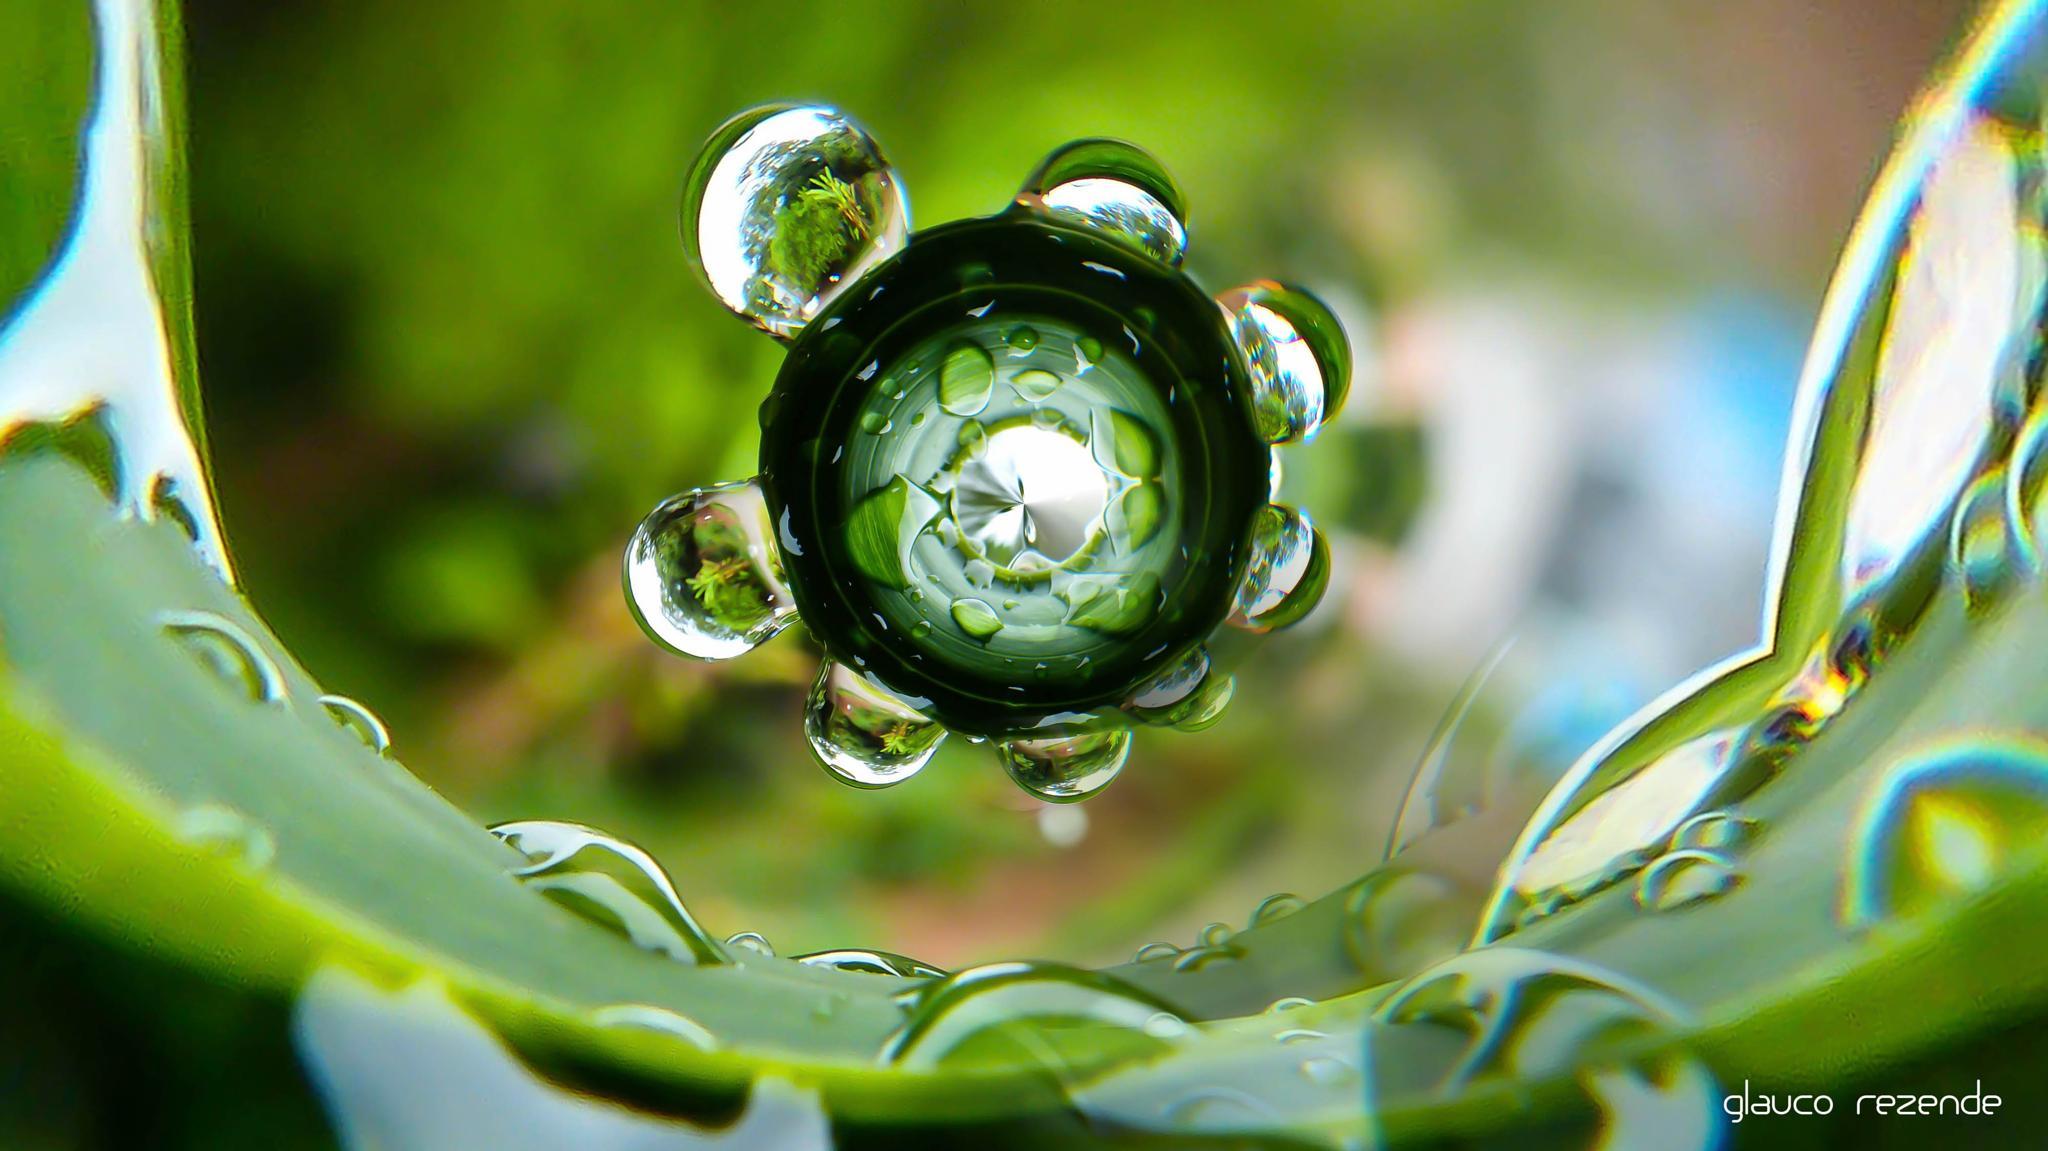 Carrossel of droplets by Glauco Rezende